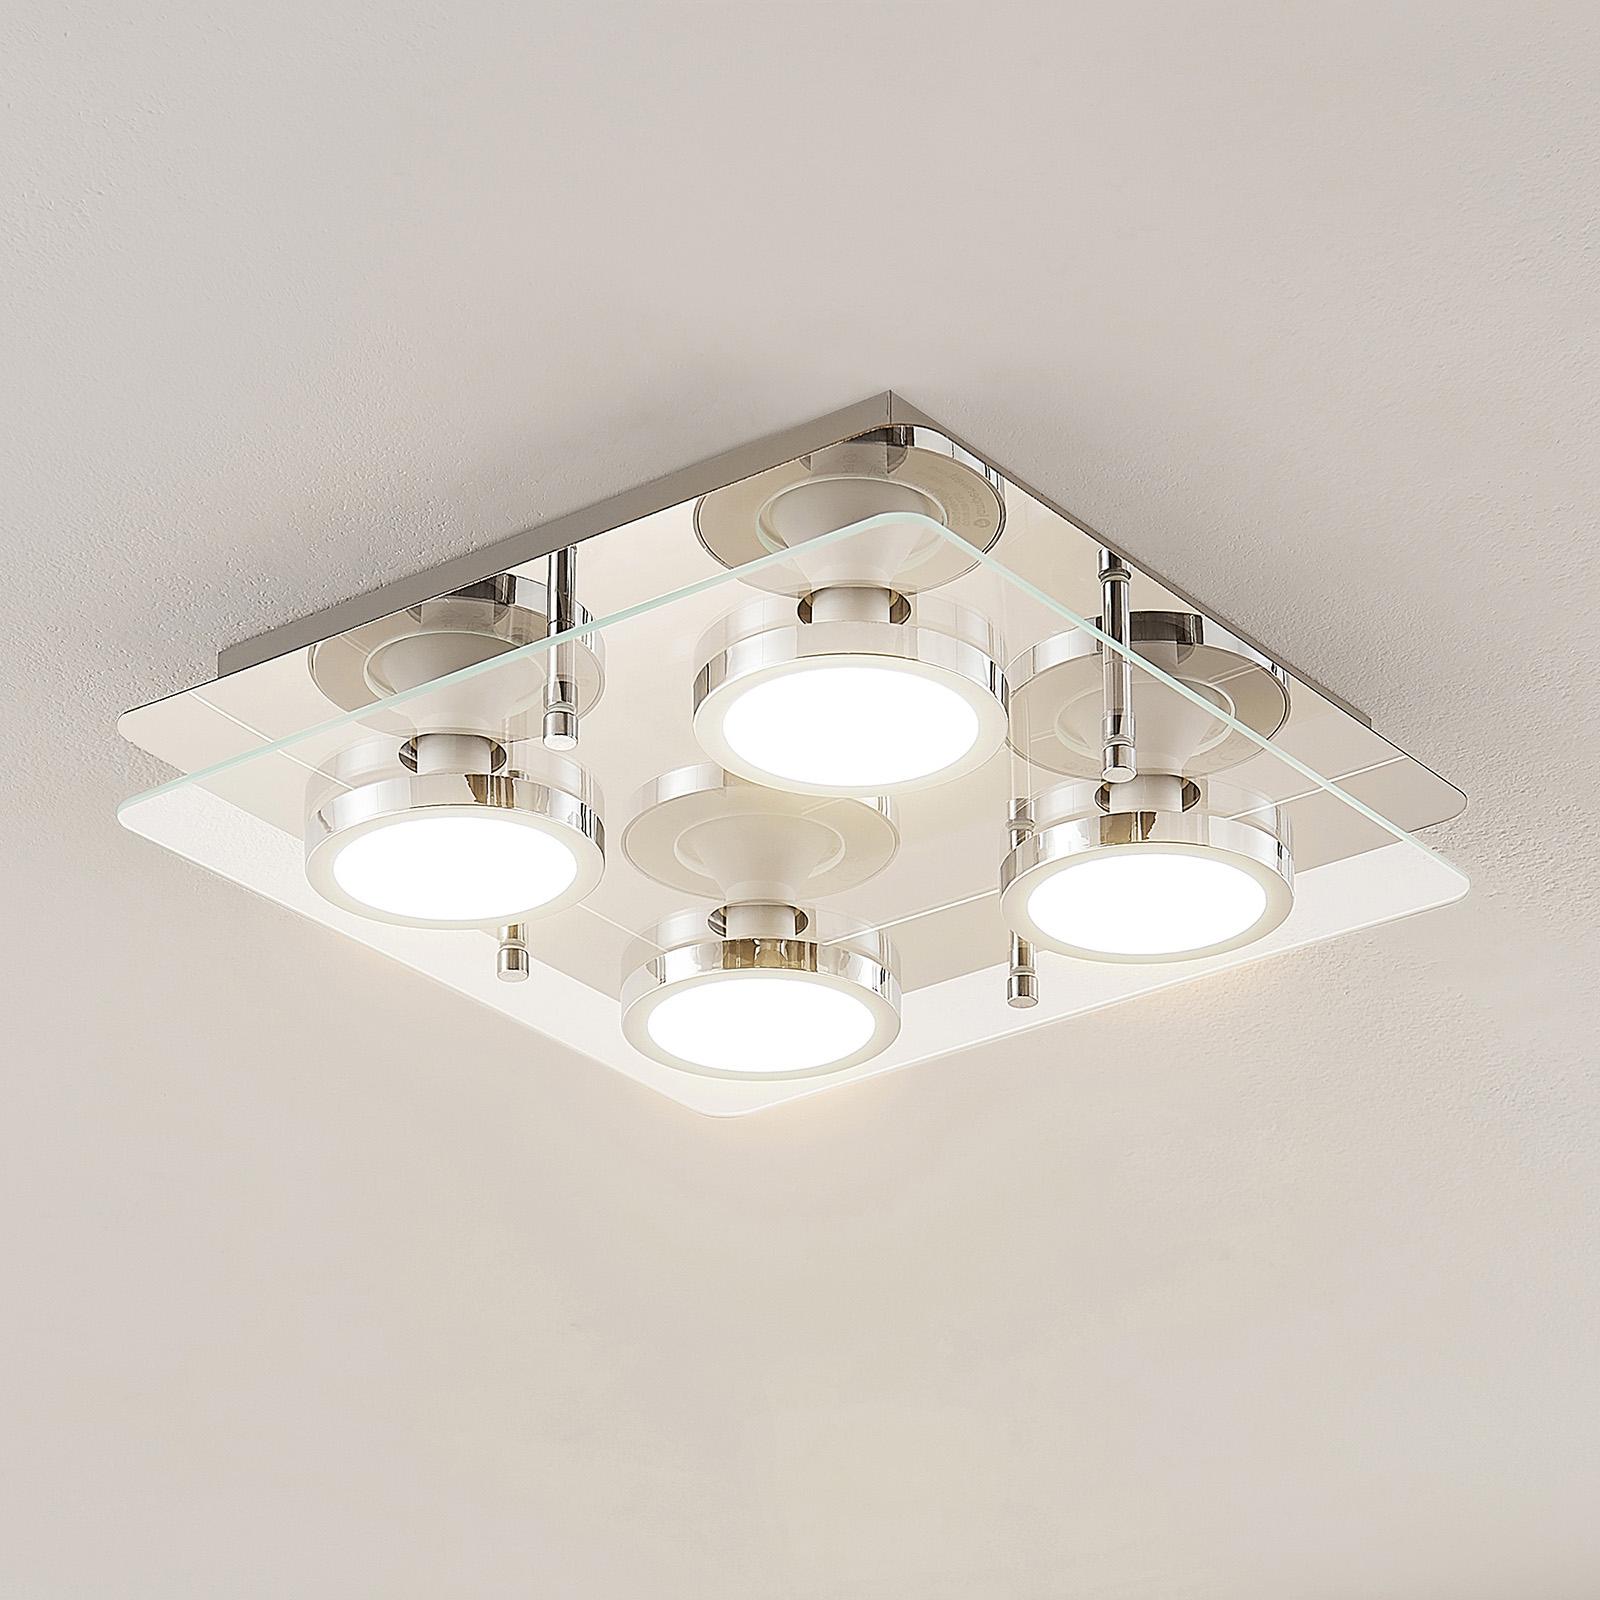 Lindby Gabryl LED -kattovalaisin, nelilamppuinen